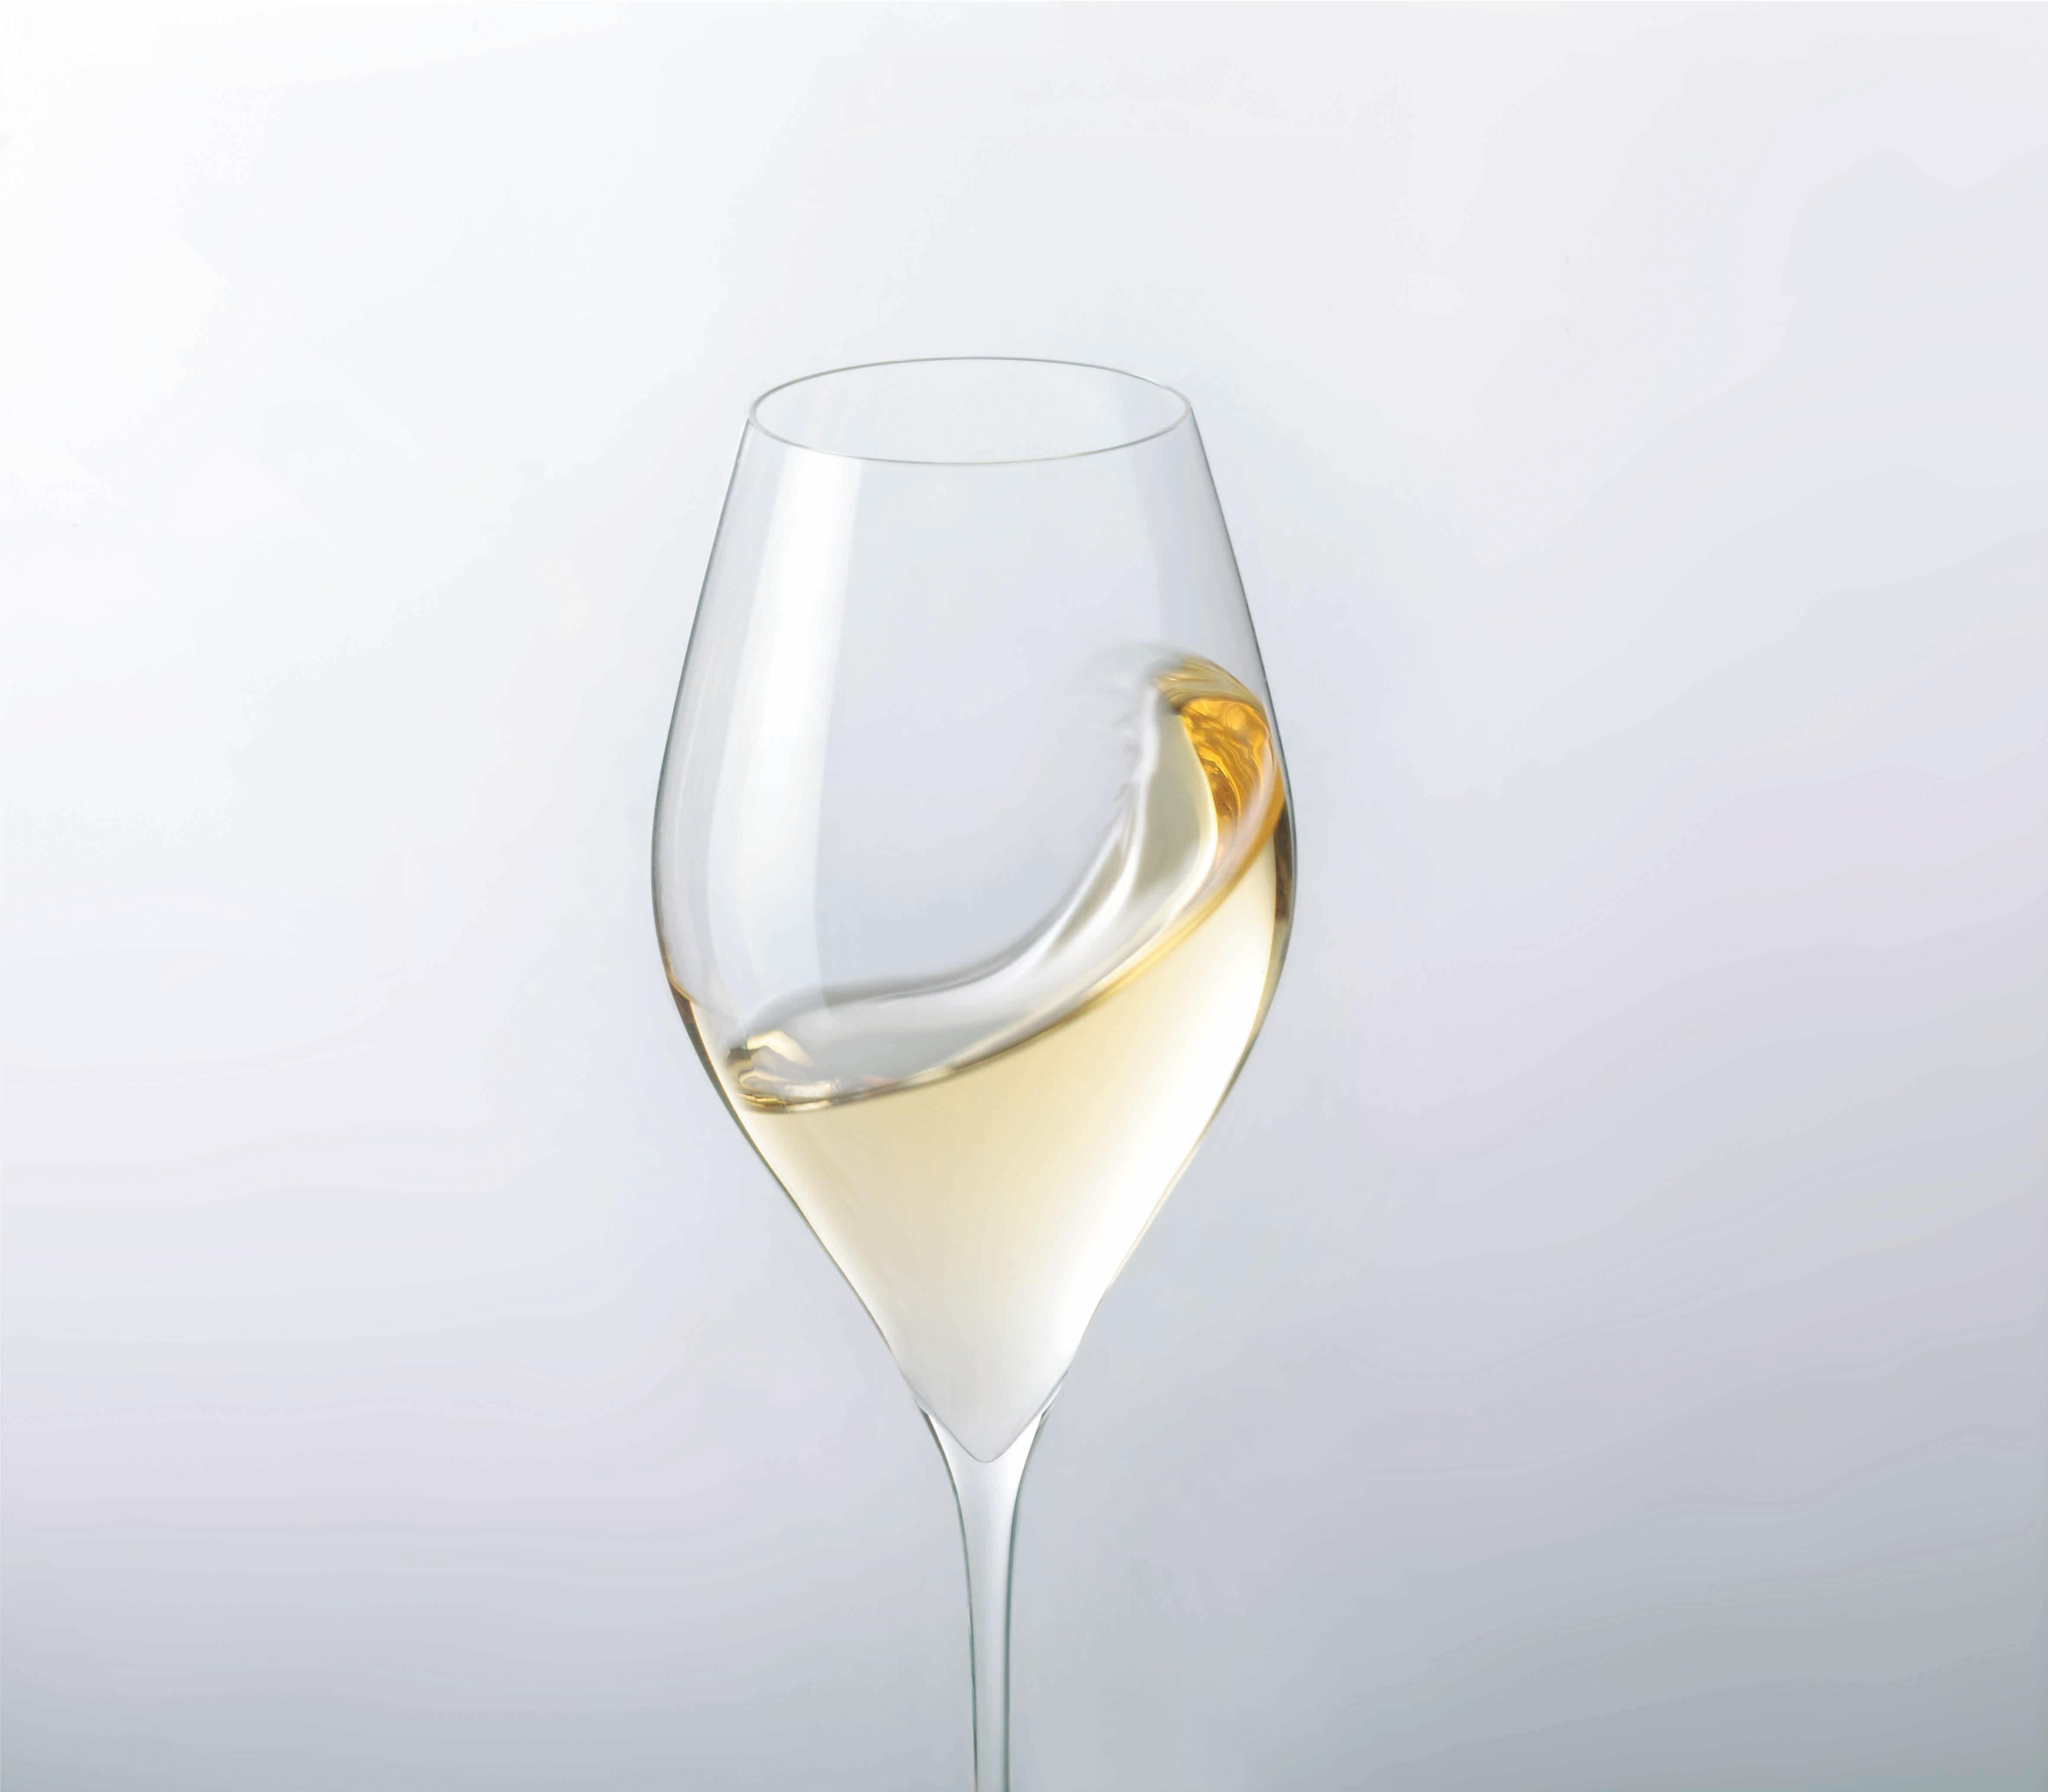 Rossini white wine glass 425 ml transparent by leonardo - Vin rossini ...